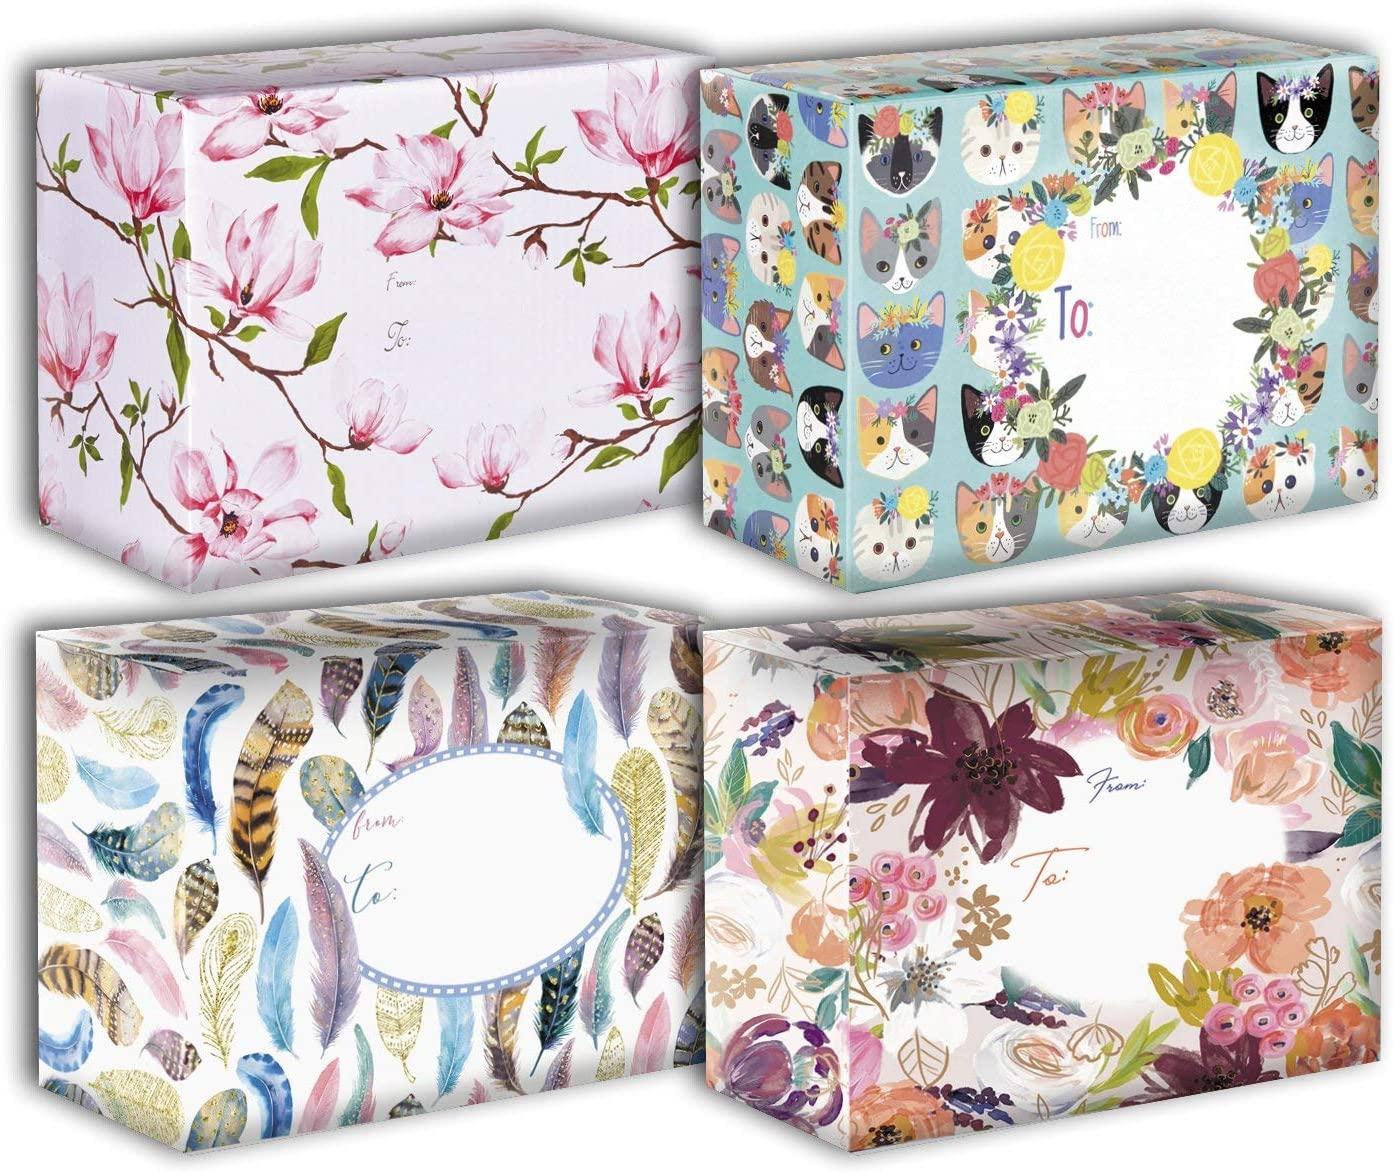 Design Mailing Box Assortment, Floral (4 Pieces)